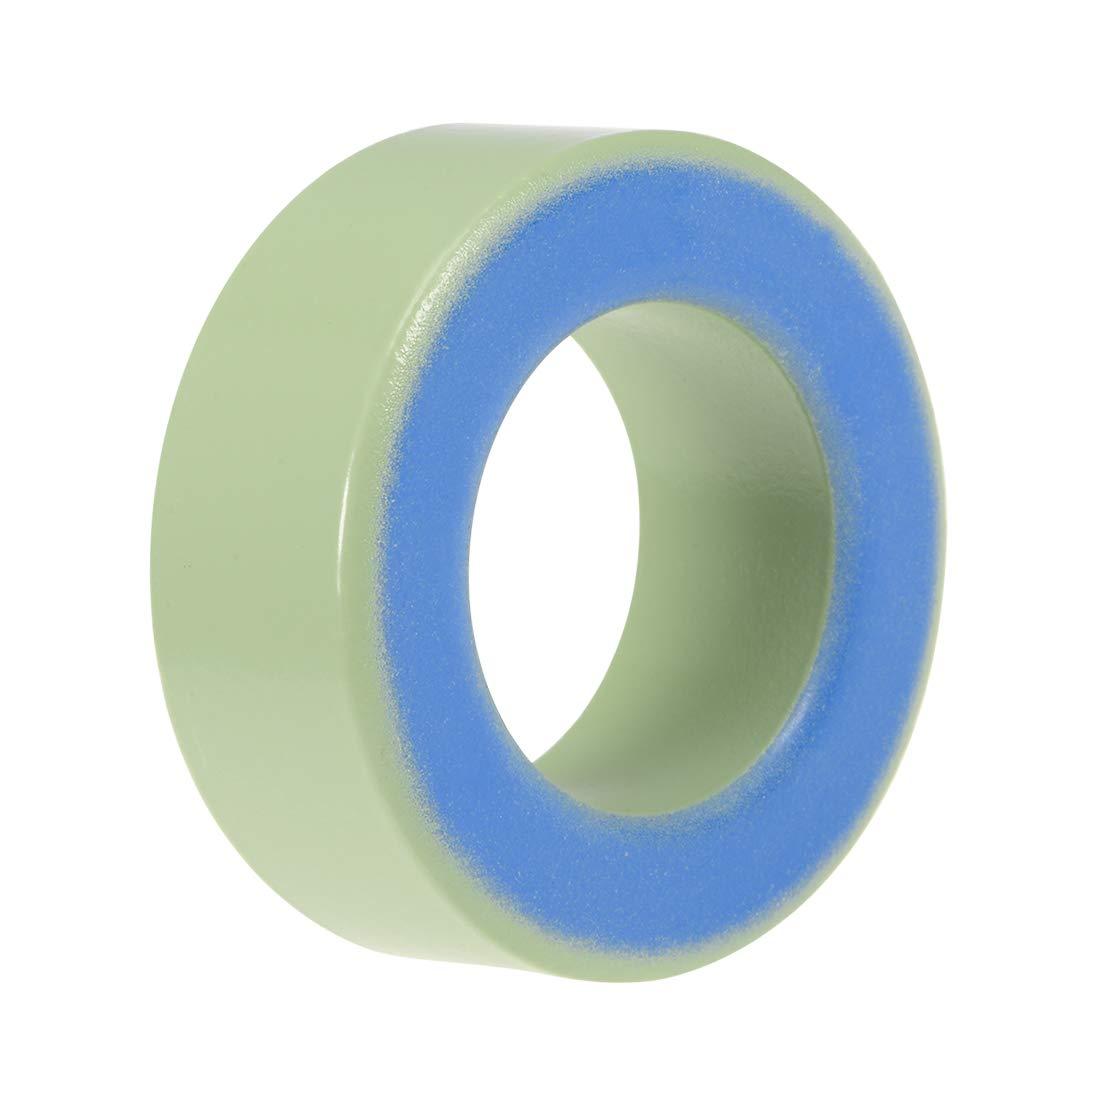 Yellow White 10pcs Ferrite Chokes Ring Iron Powder Inductor Ferrite Rings sourcing map Toroid Core 14 x 27.3 x 14.8mm